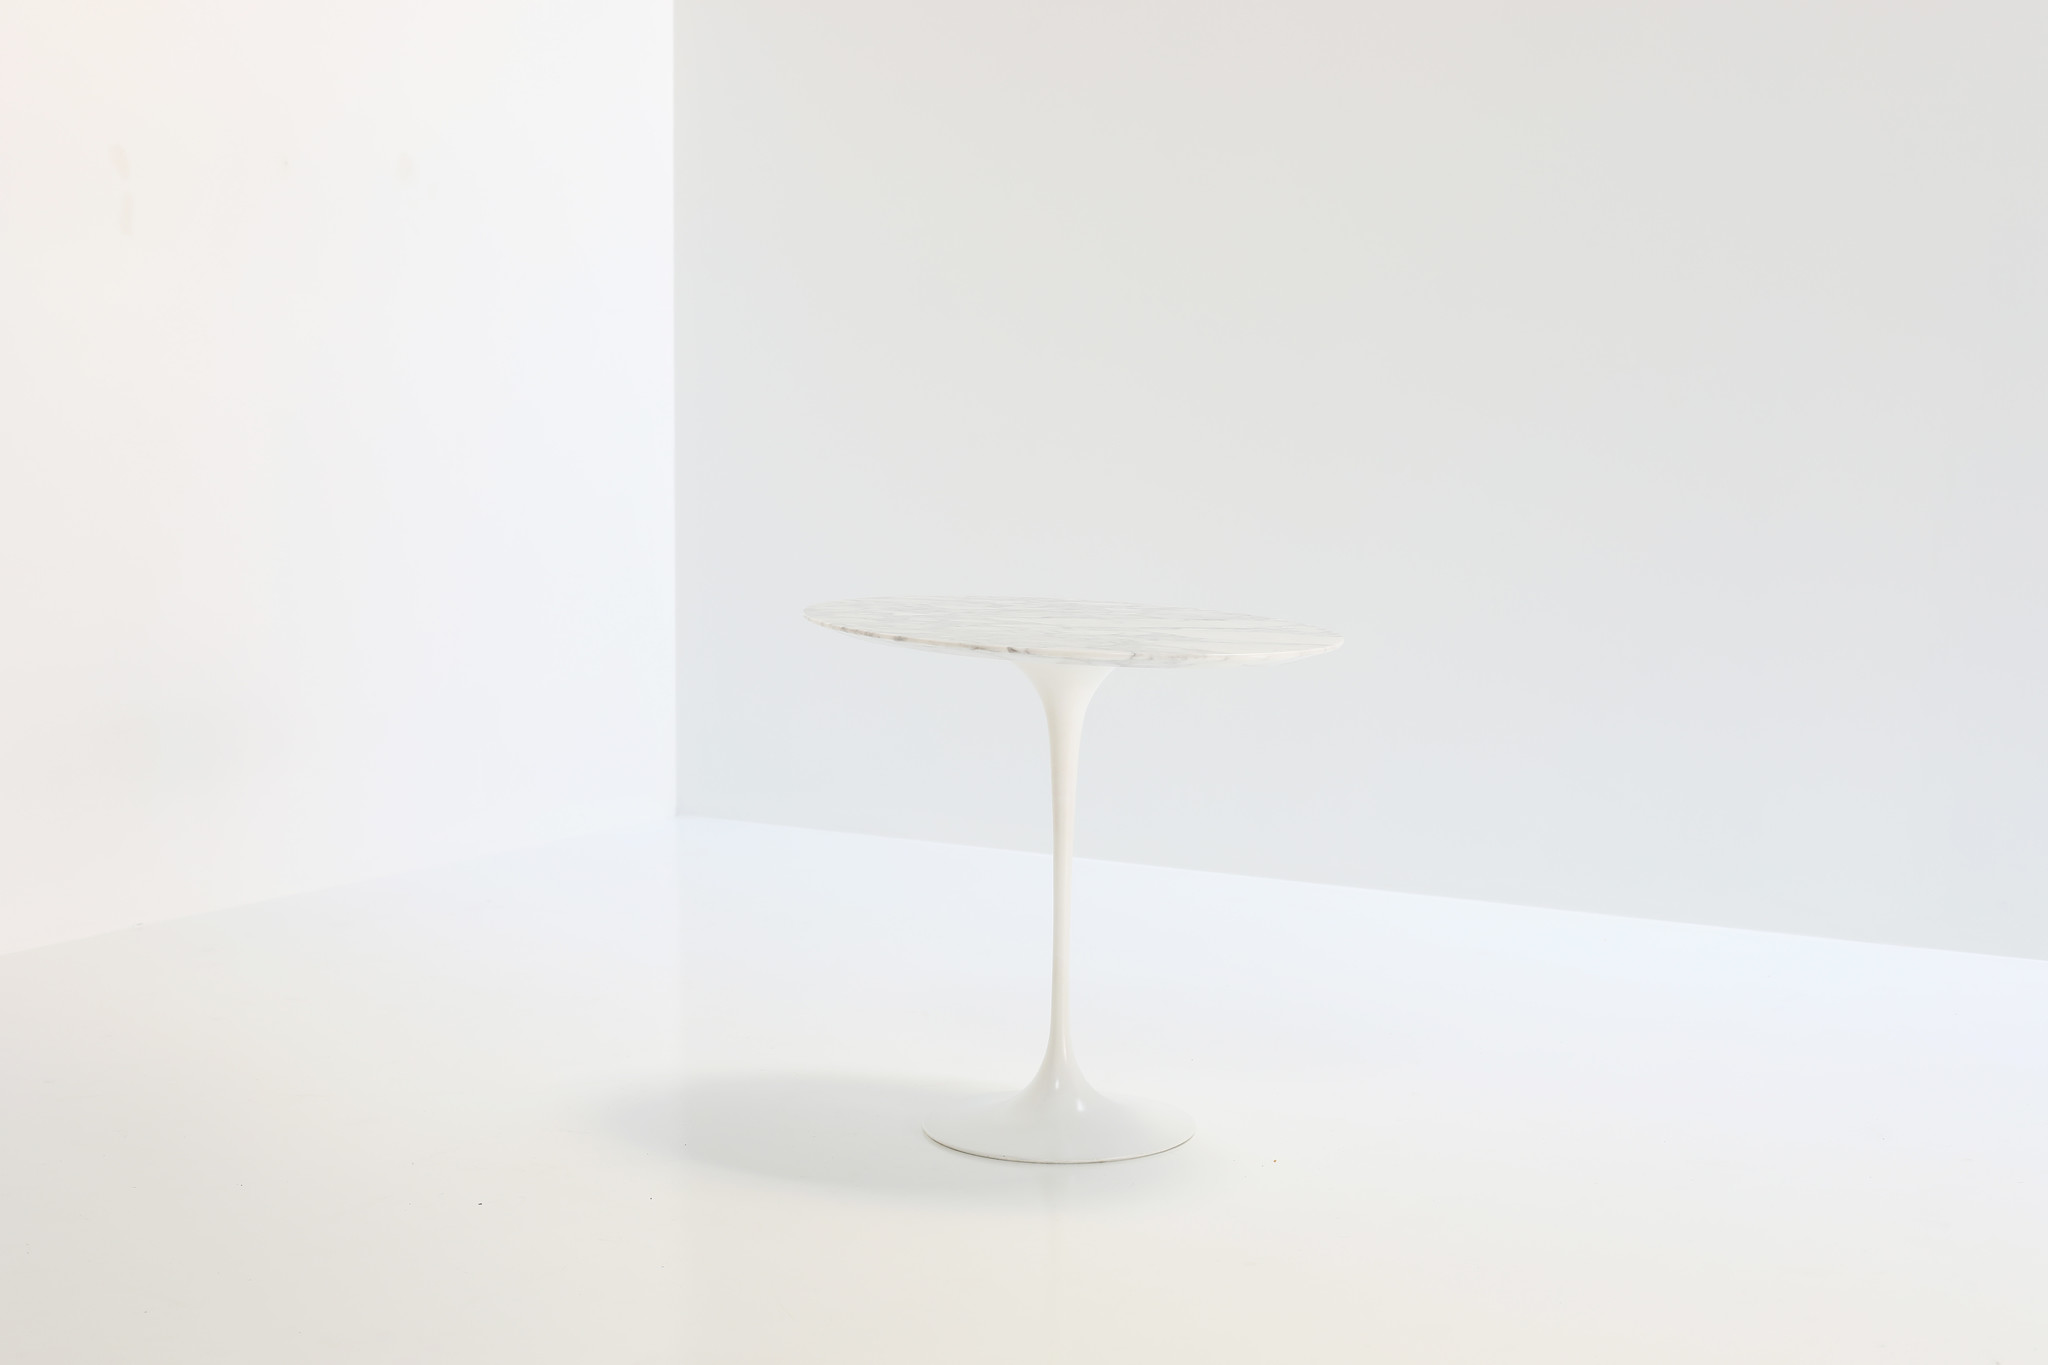 Oval side table Eero Saarinen, 1950's